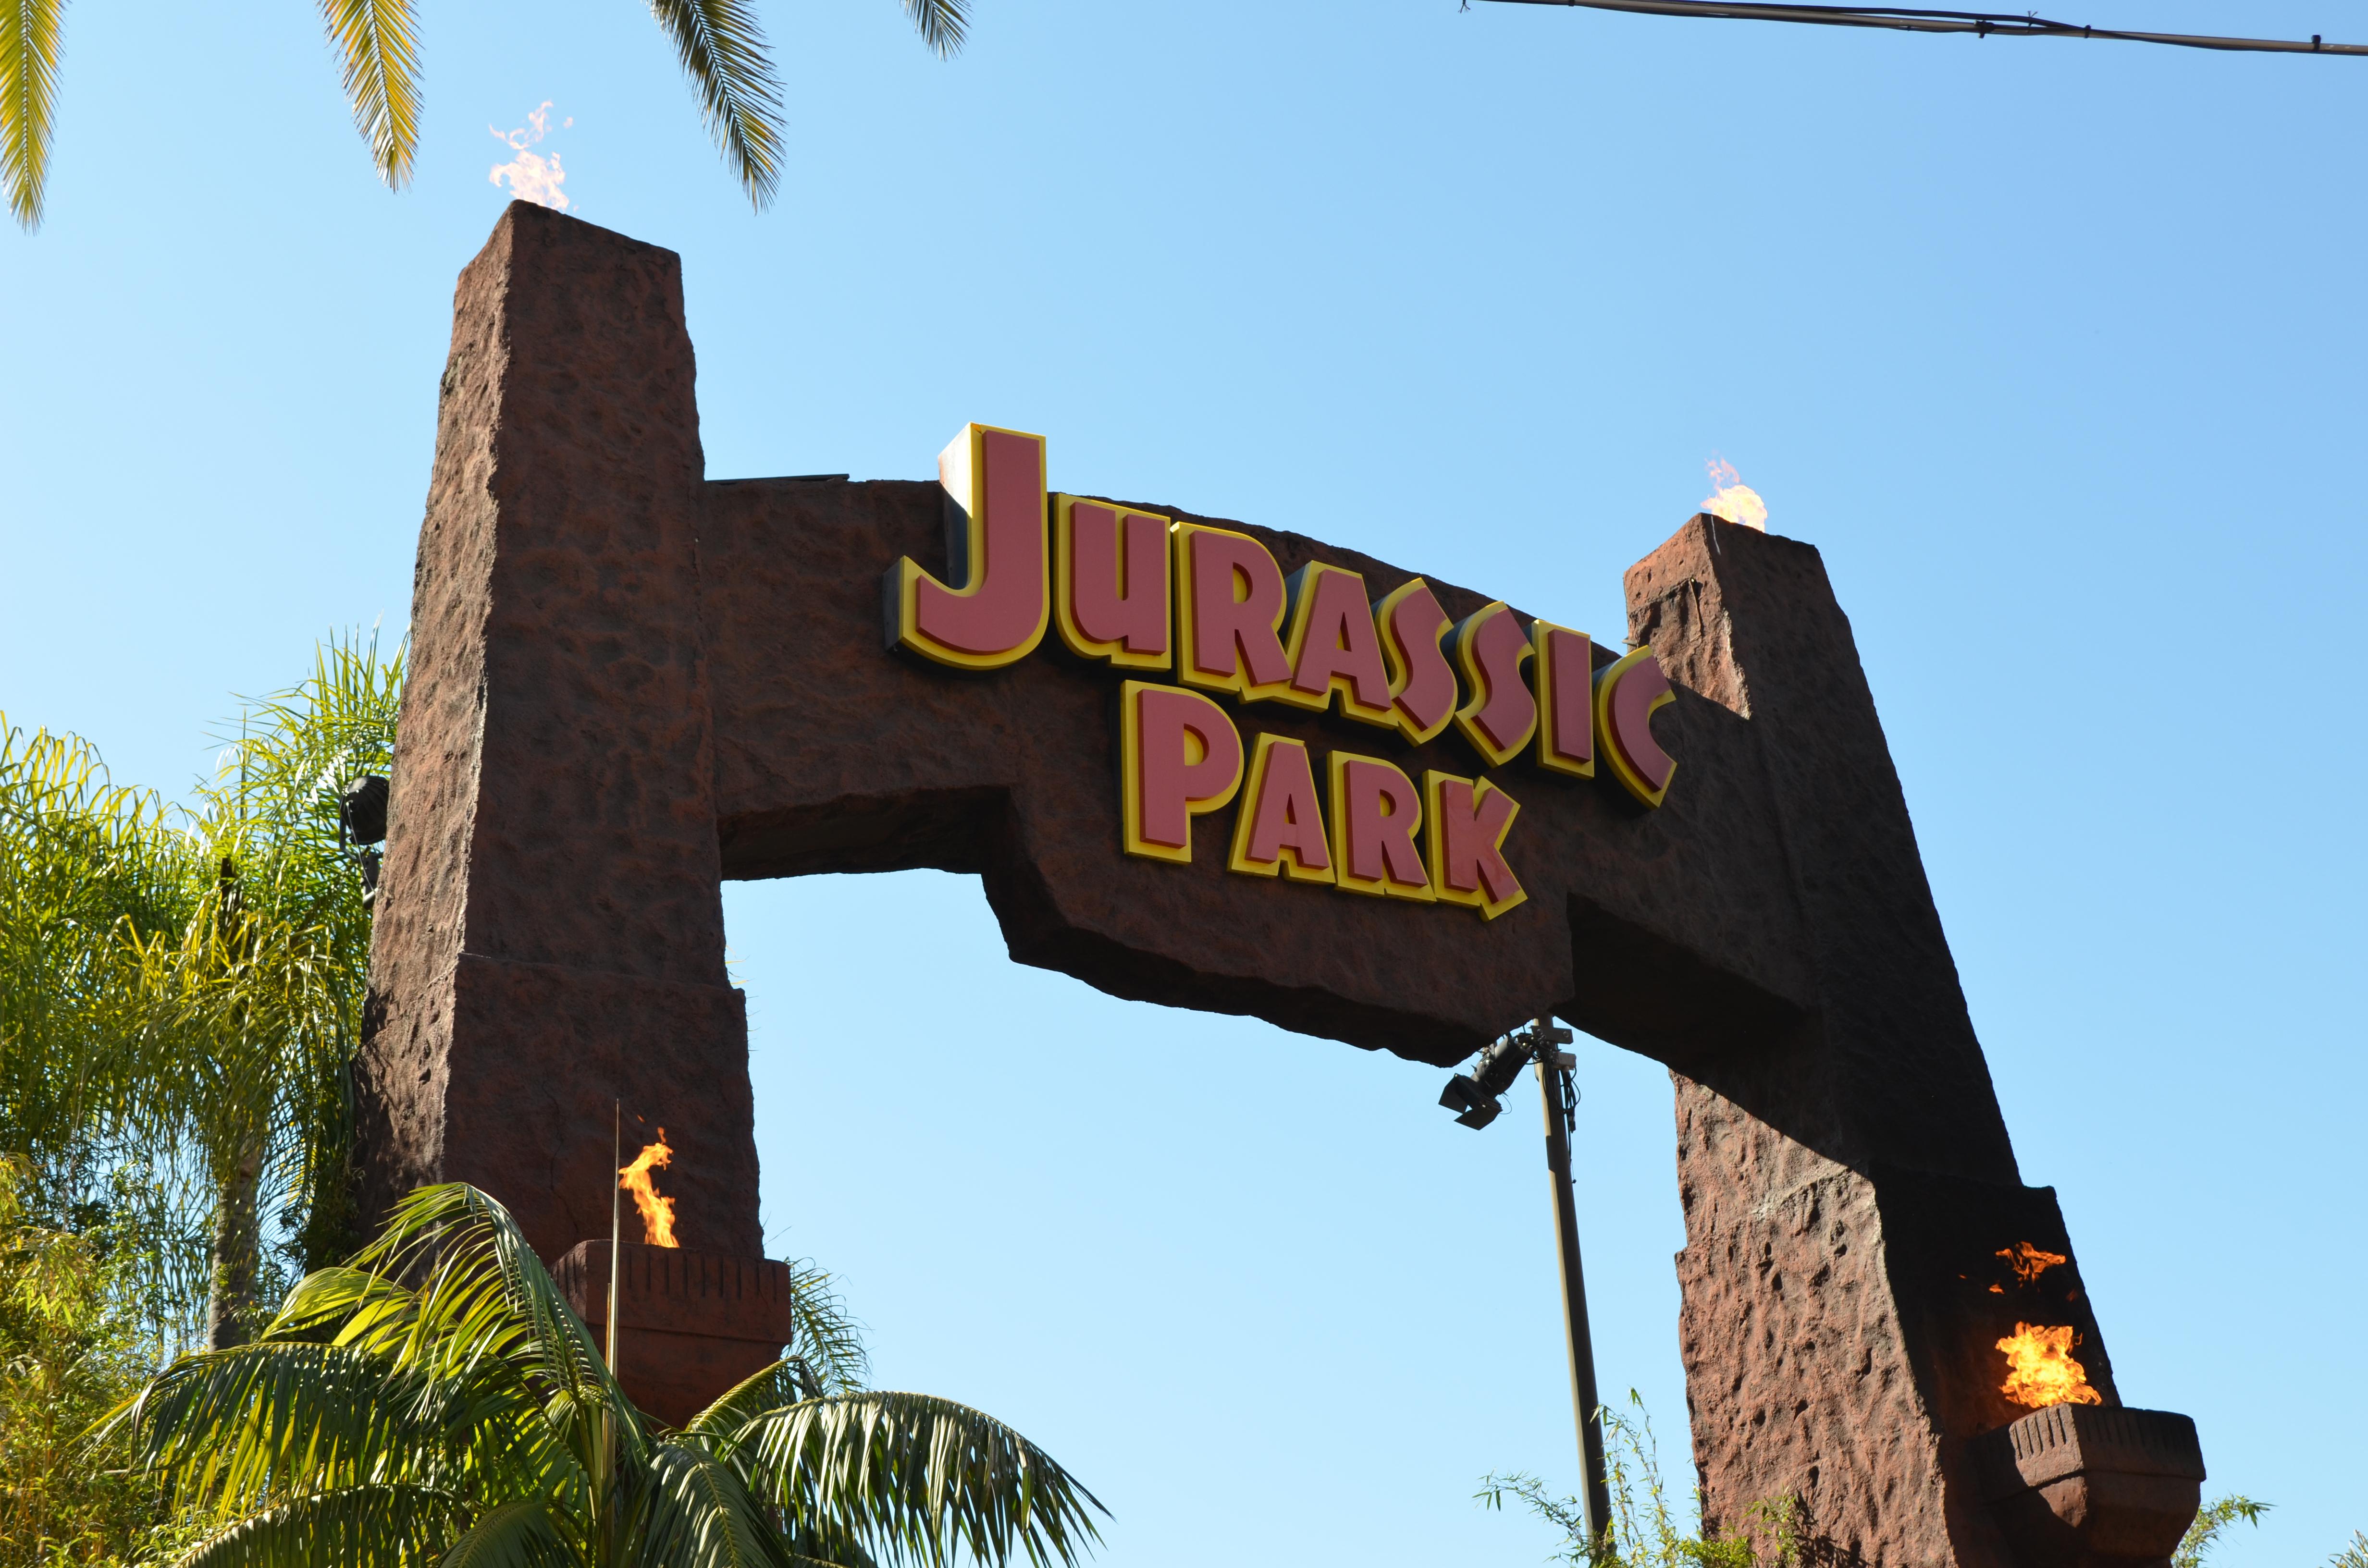 Jurrassic Park Universal Studios Hollywood